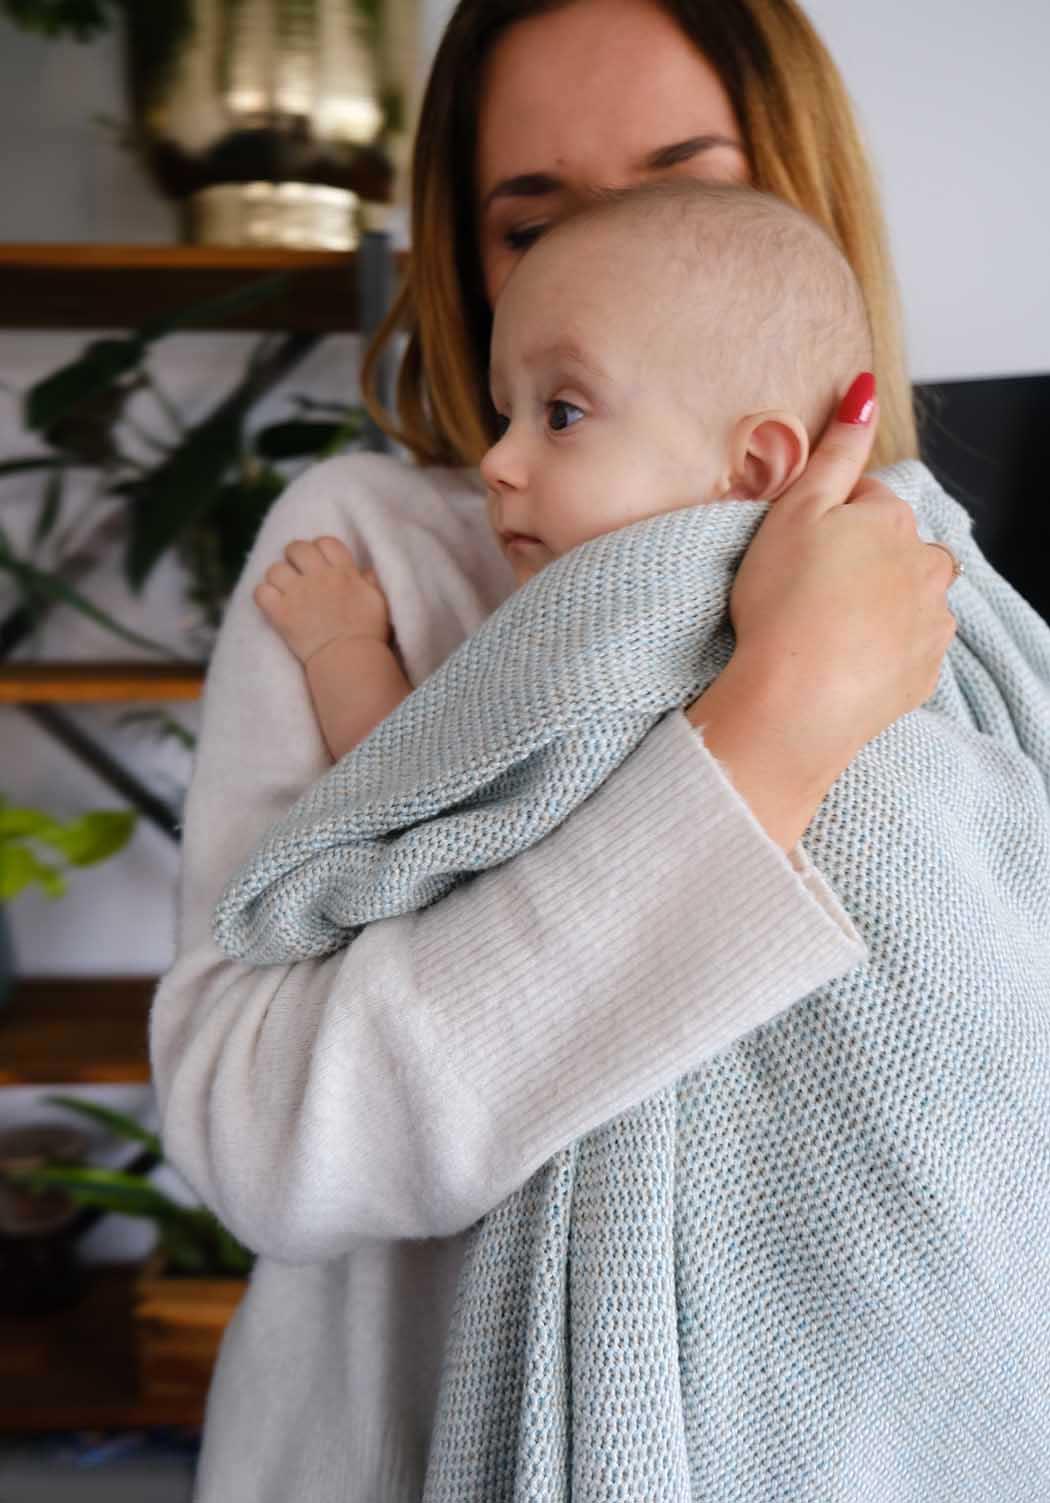 Blanket care